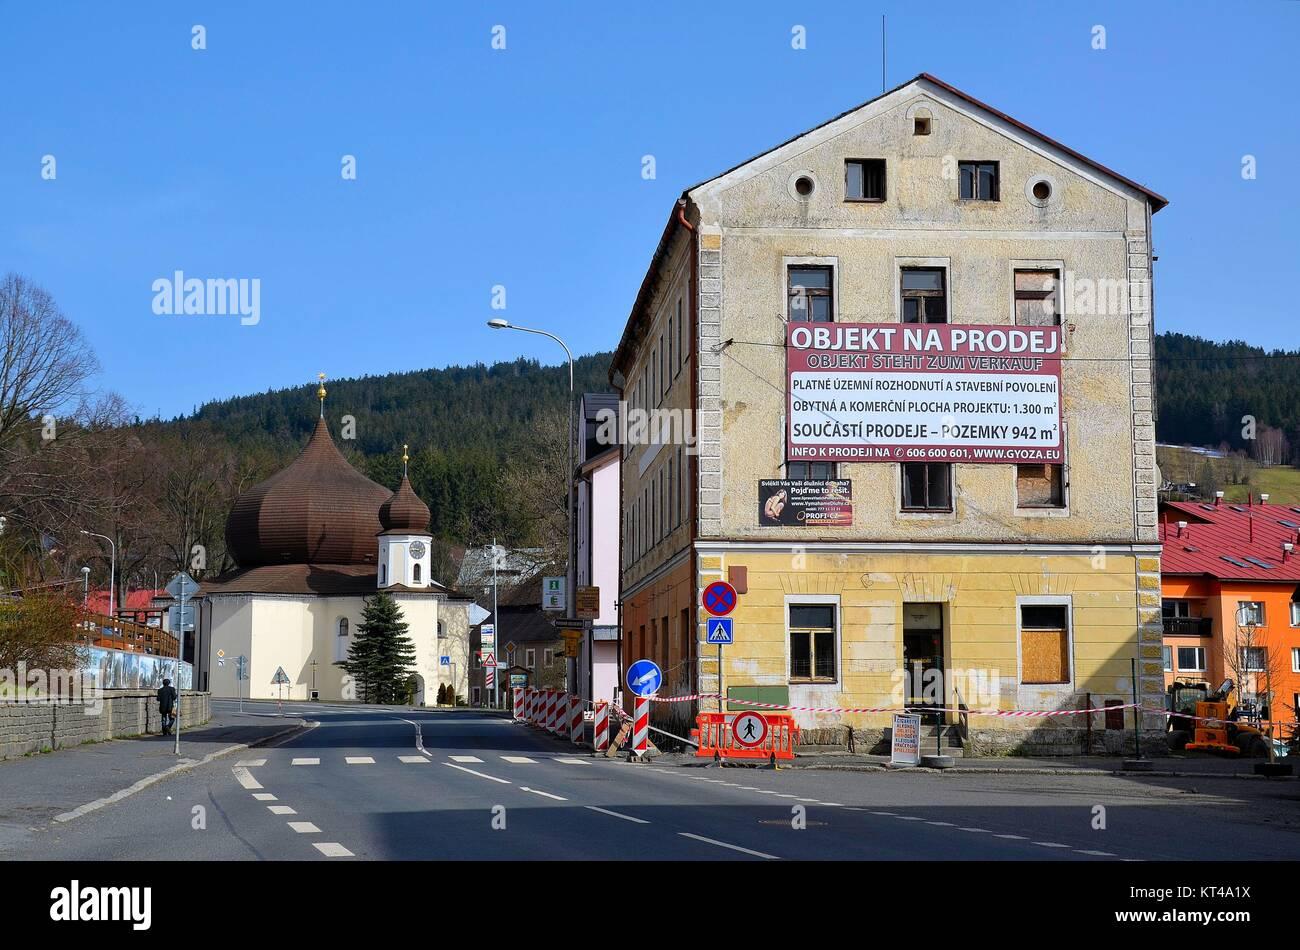 The village of Železná Ruda (Markt Eisenstein), Czech Republic, at the border to Bavaria - Stock Image